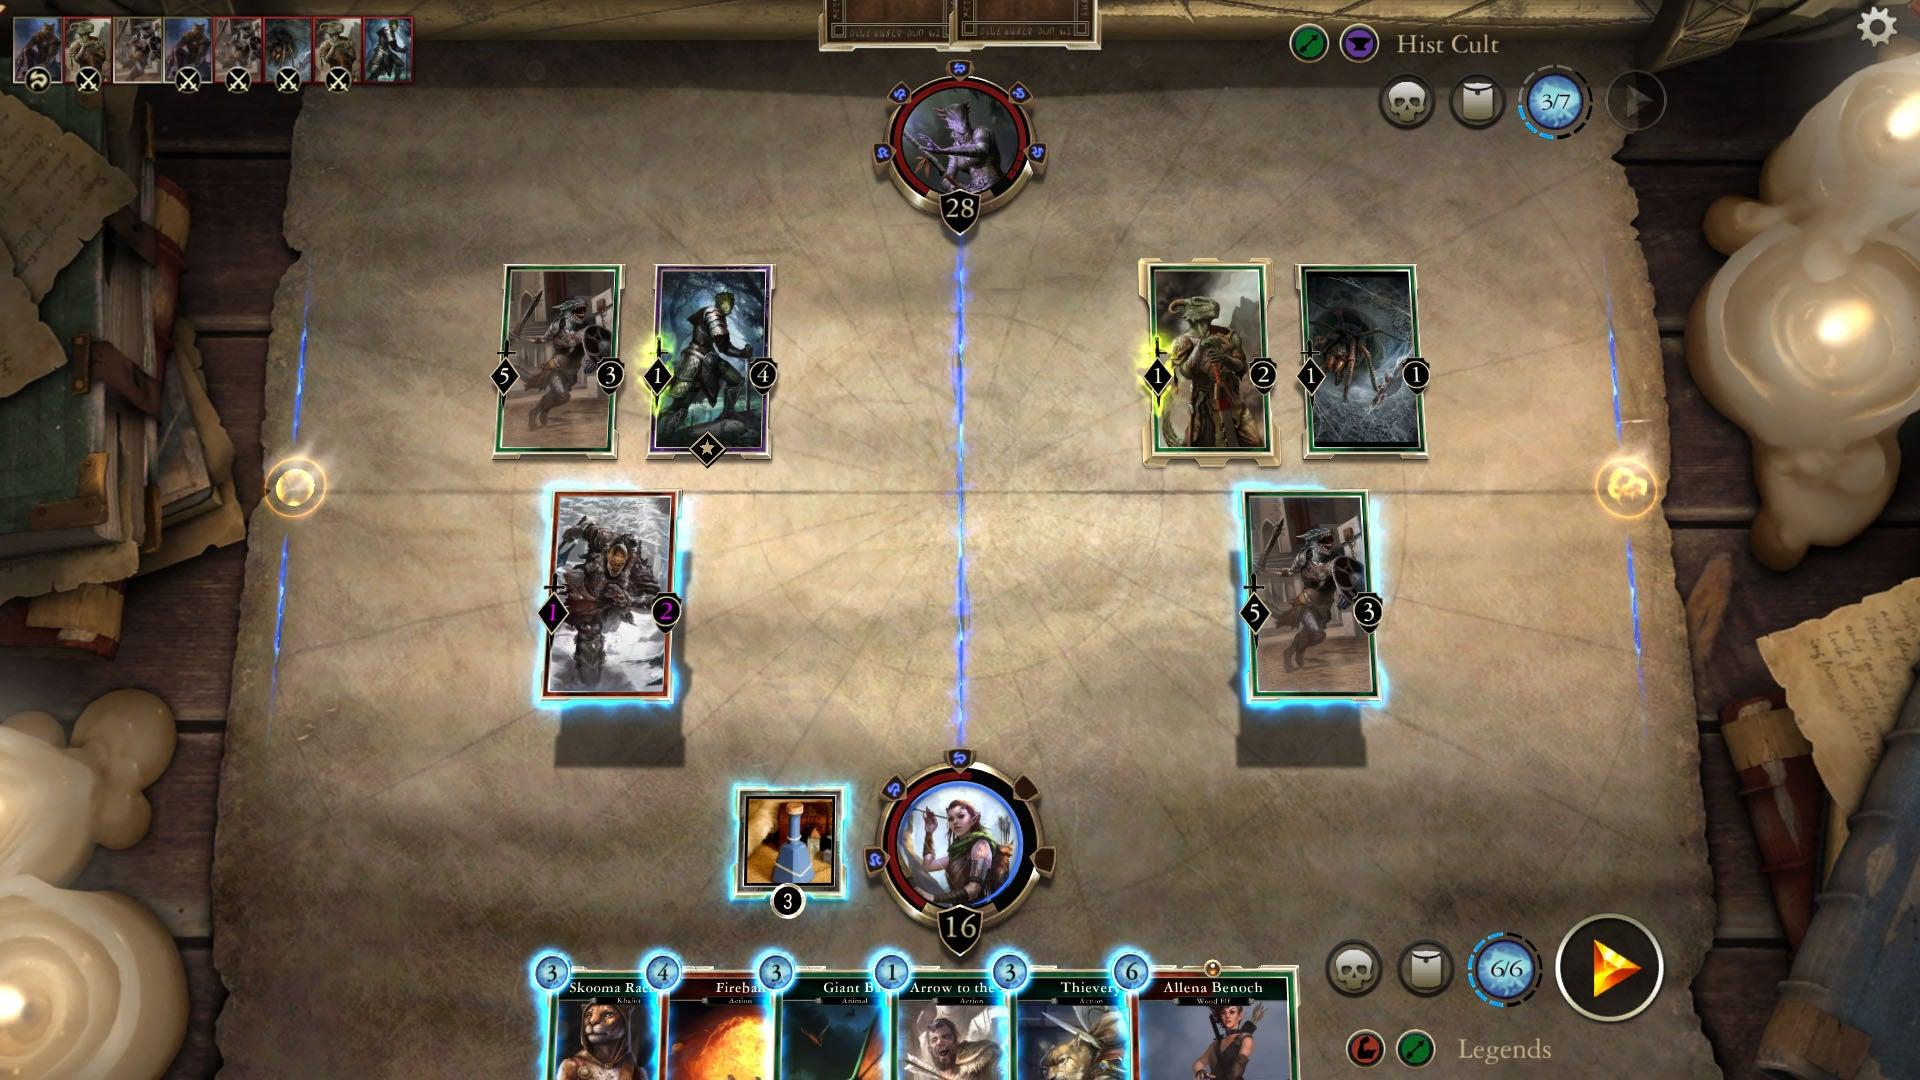 Image for The Elder Scrolls: Legends has entered open beta